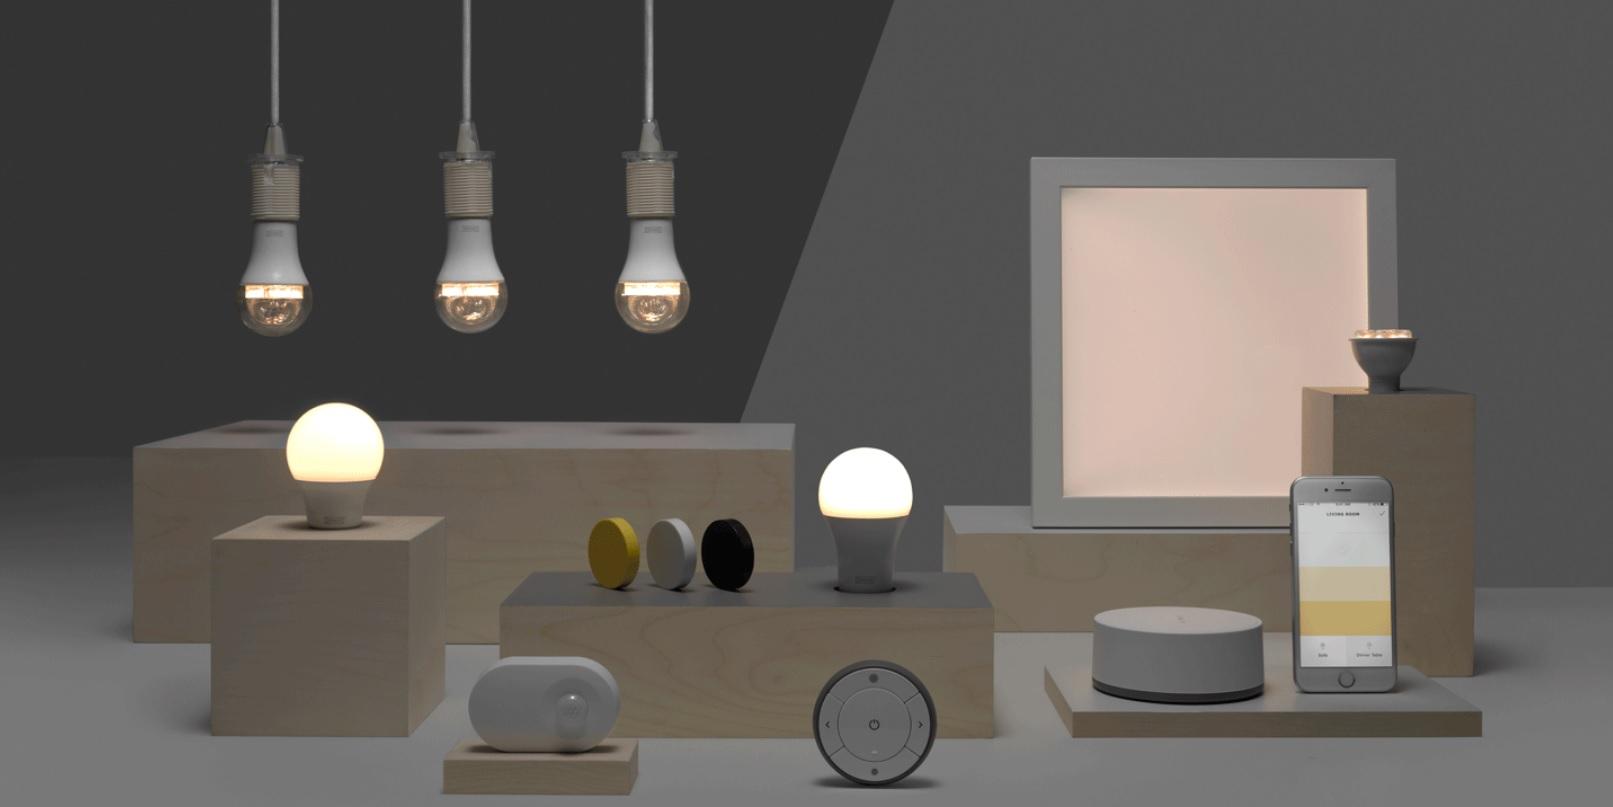 IKEA offers affordable smart home lighting to broke millennials